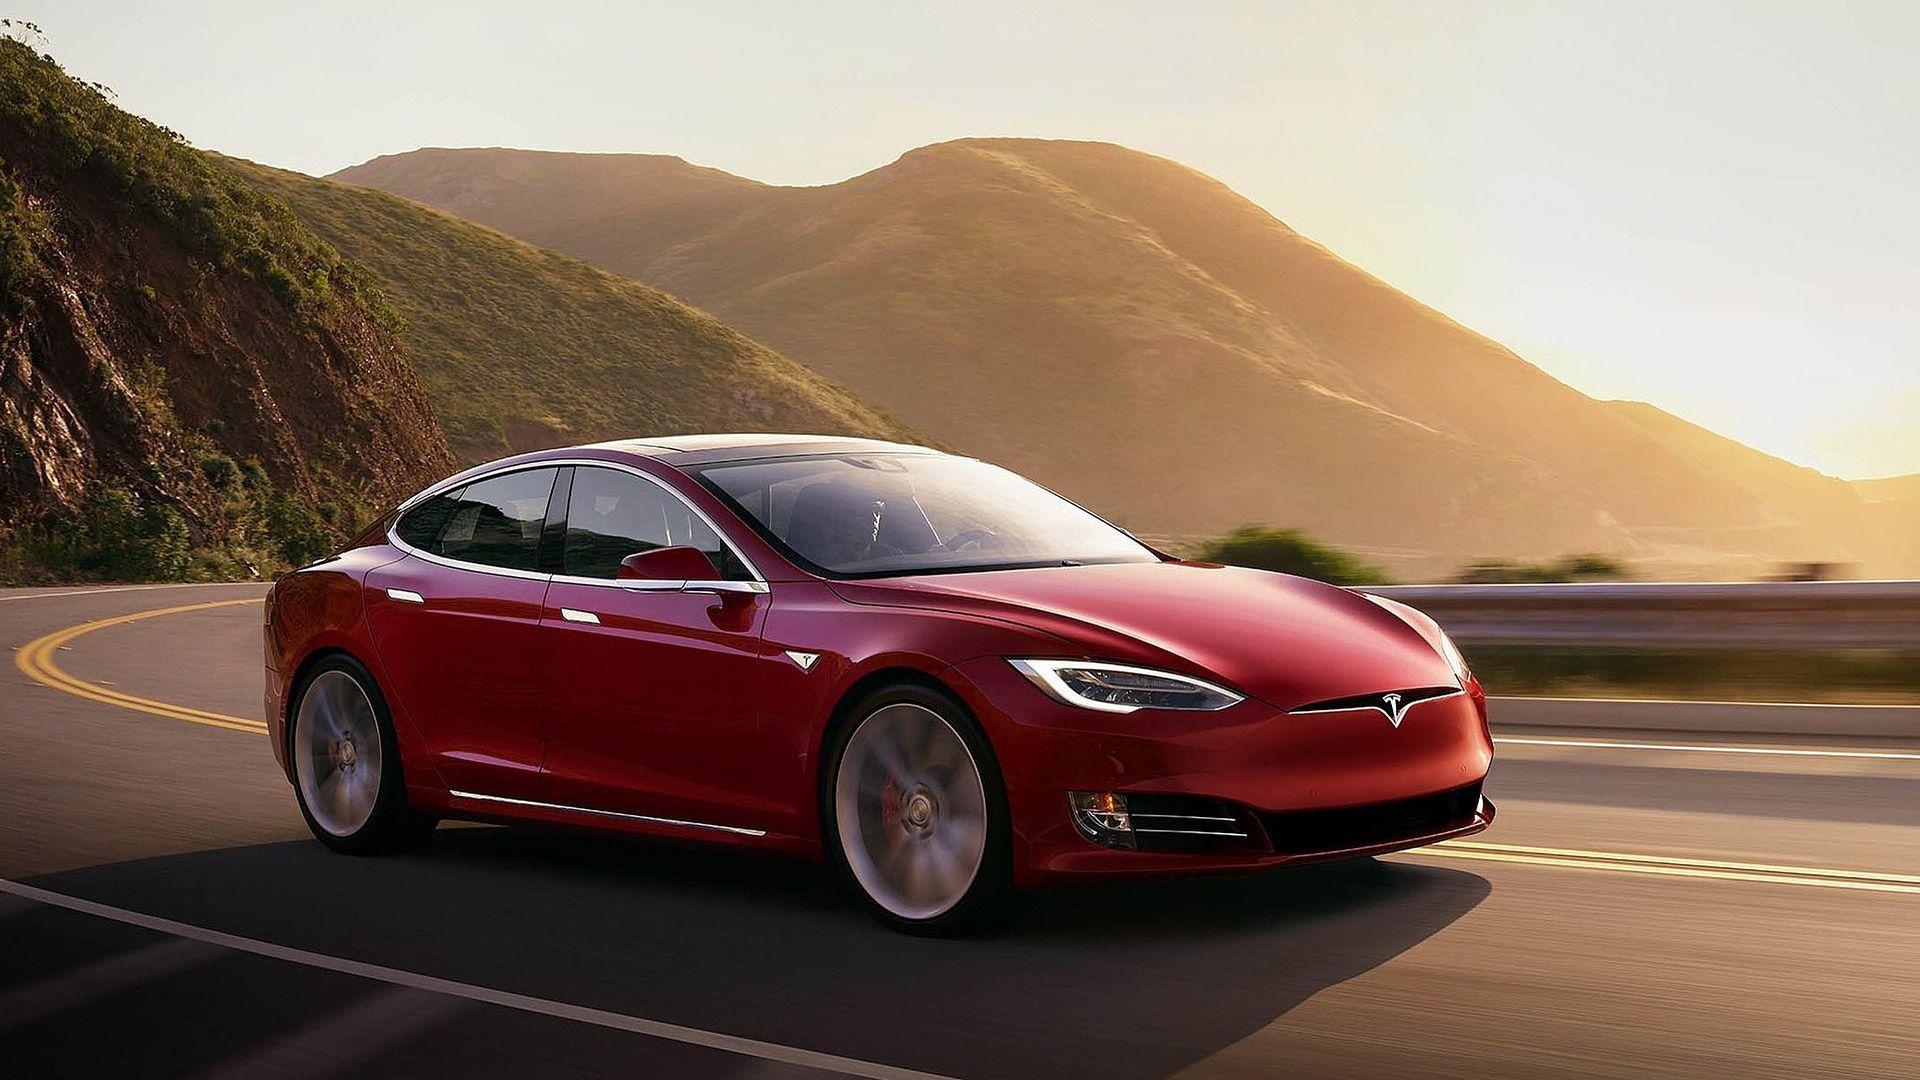 Tesla Cars Wallpapers Wallpaper Cave